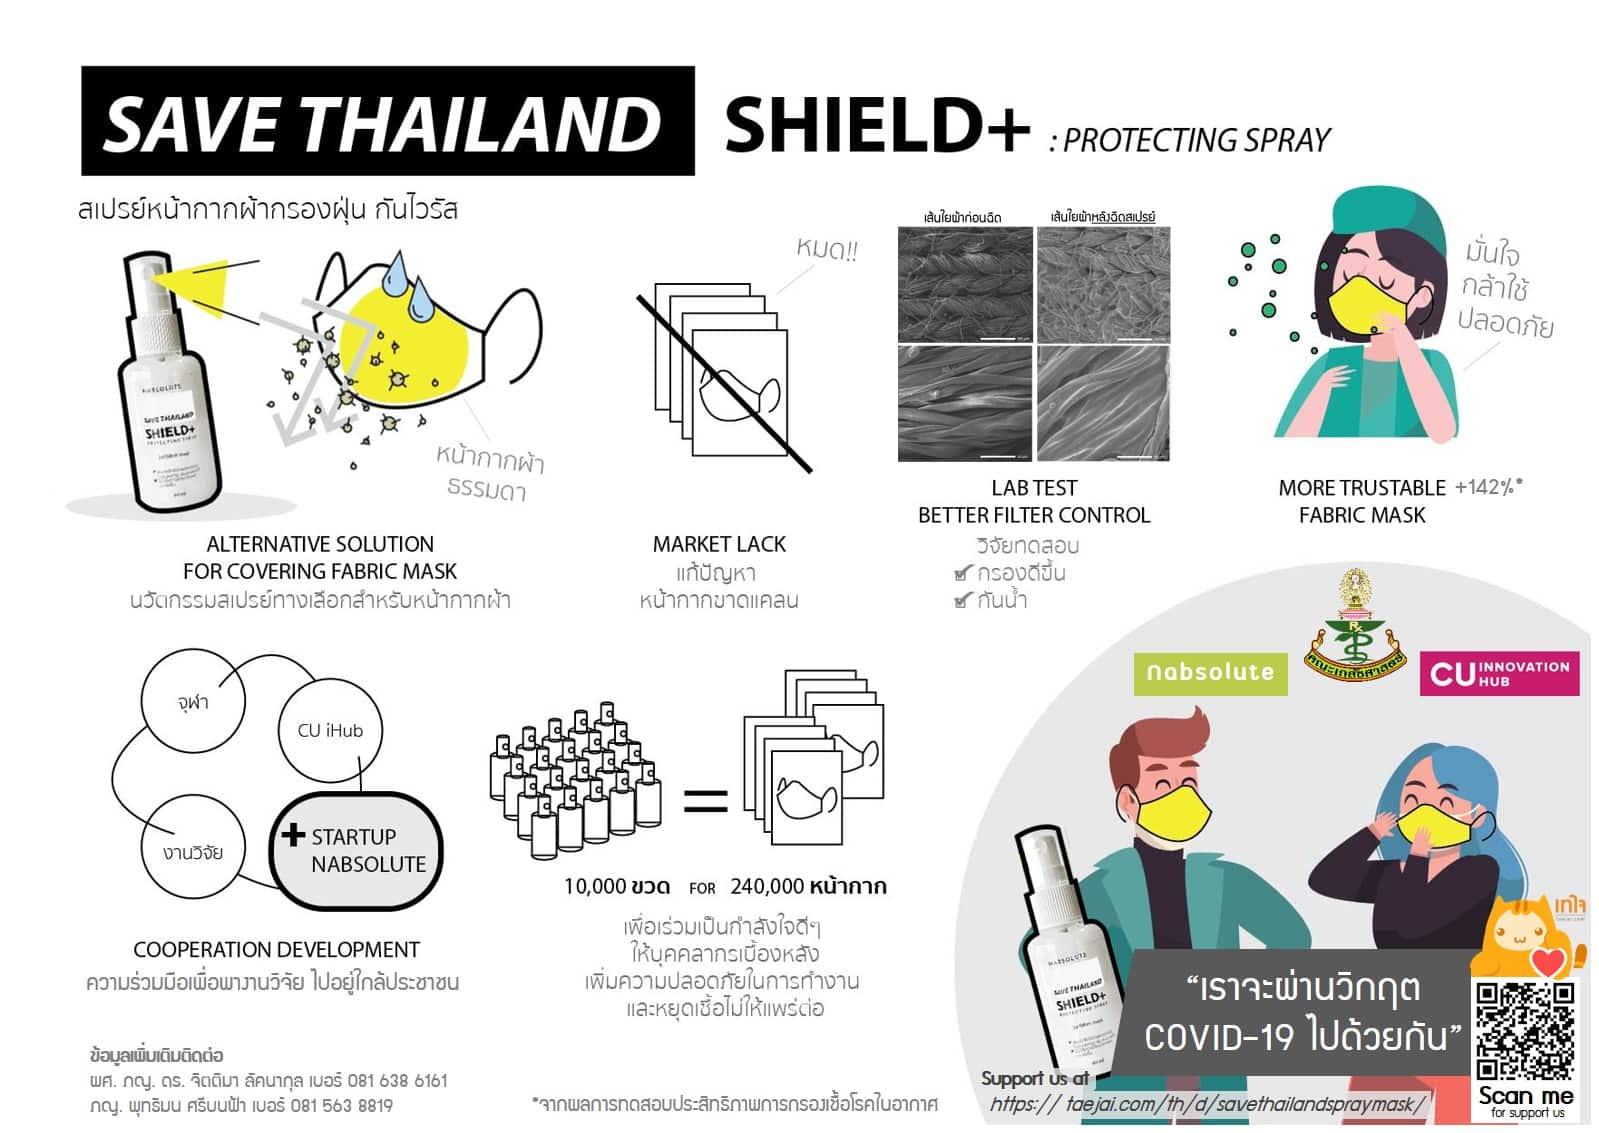 Shield Protecting spray Photo 3 infographic - จุฬาฯ คิดค้นสเปรย์เพิ่มประสิทธิภาพหน้ากากผ้าป้องกันโควิด-19